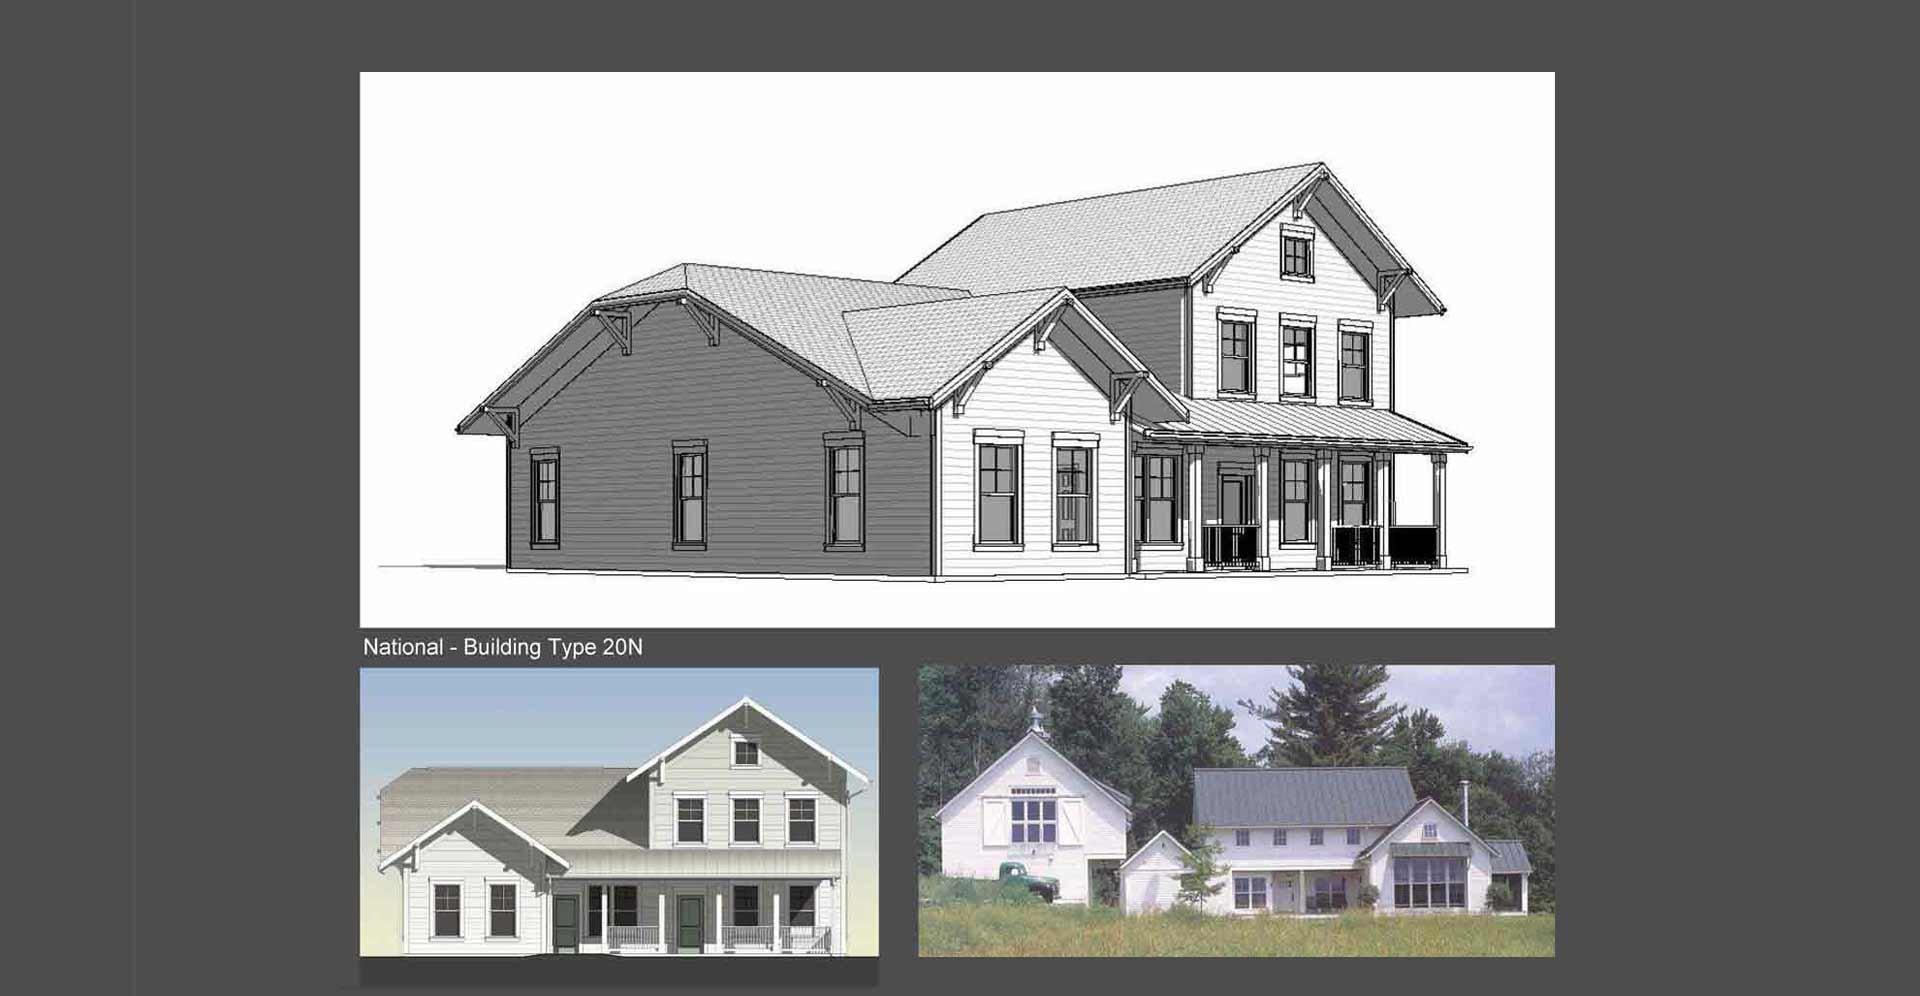 West Rock Development Master Plans